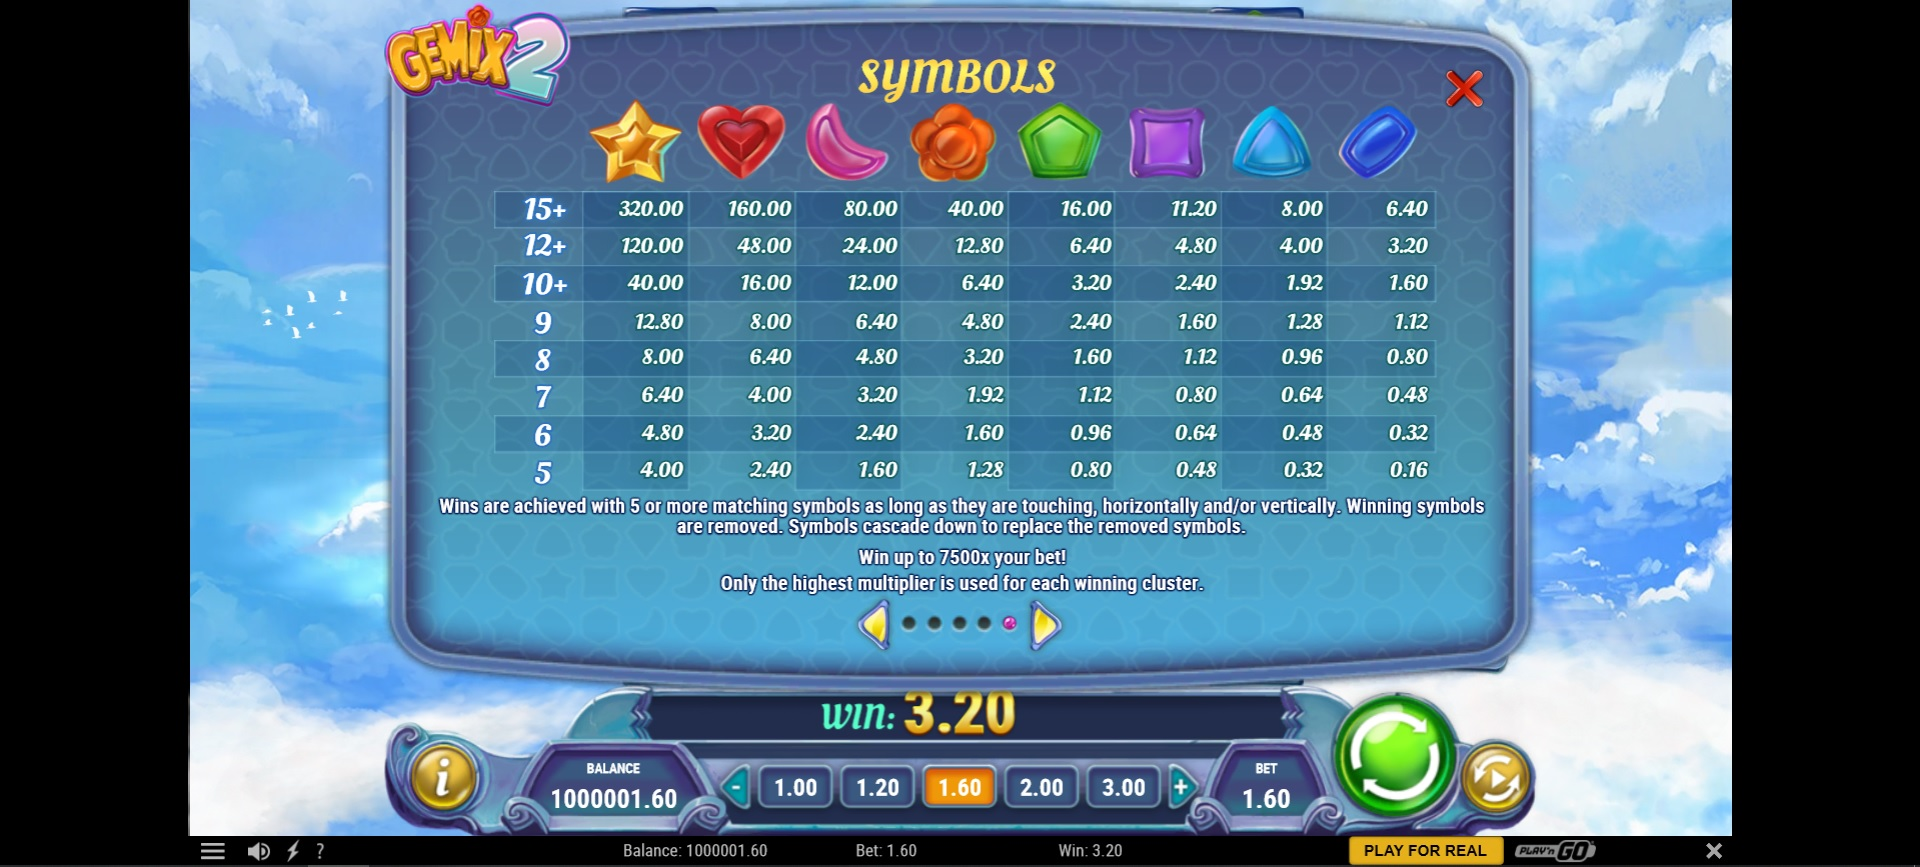 Gemix 2 paytable